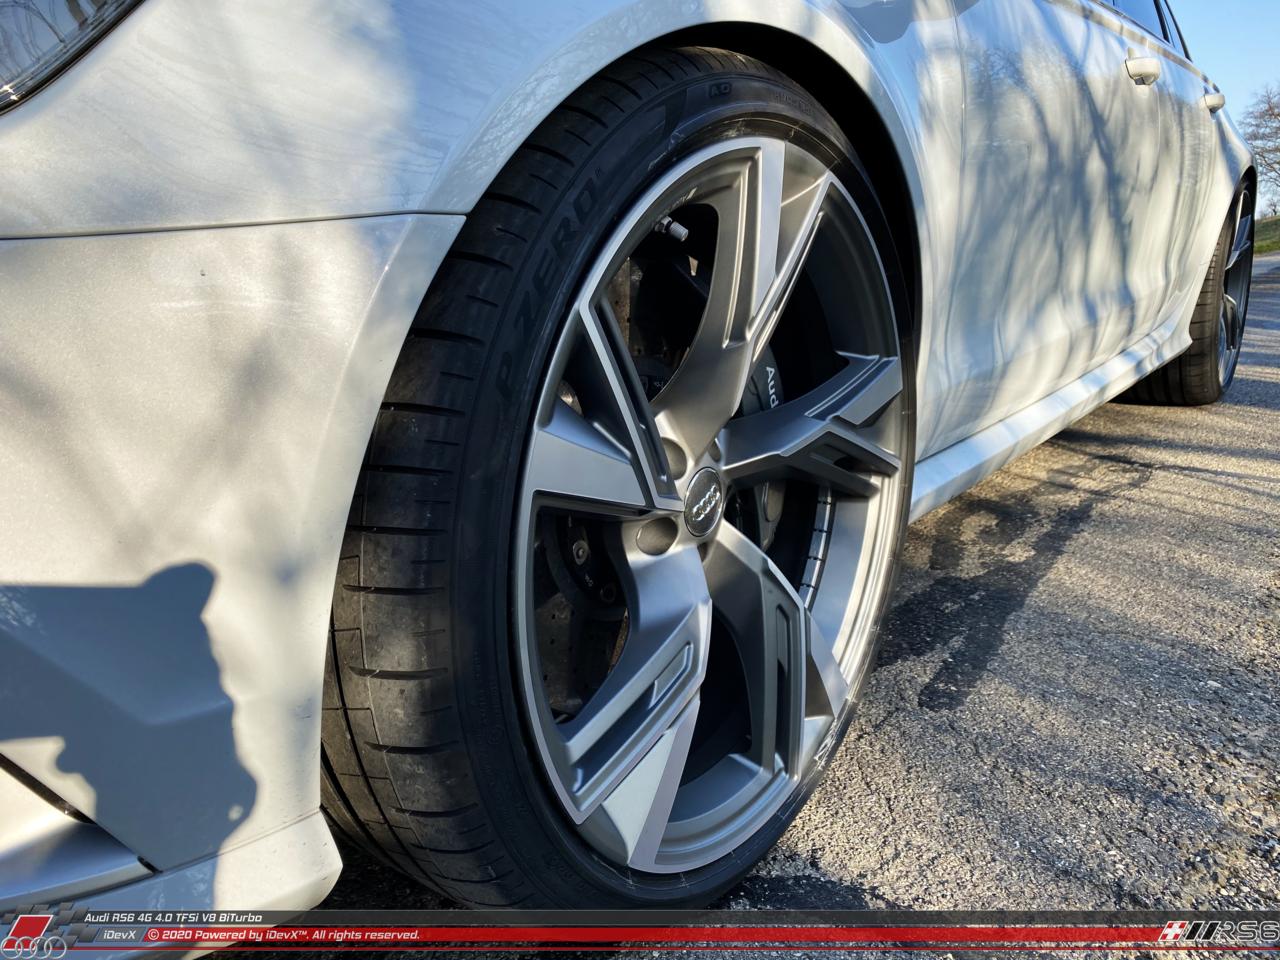 18.03.2020_Audi-RS6_iDevX_014.png